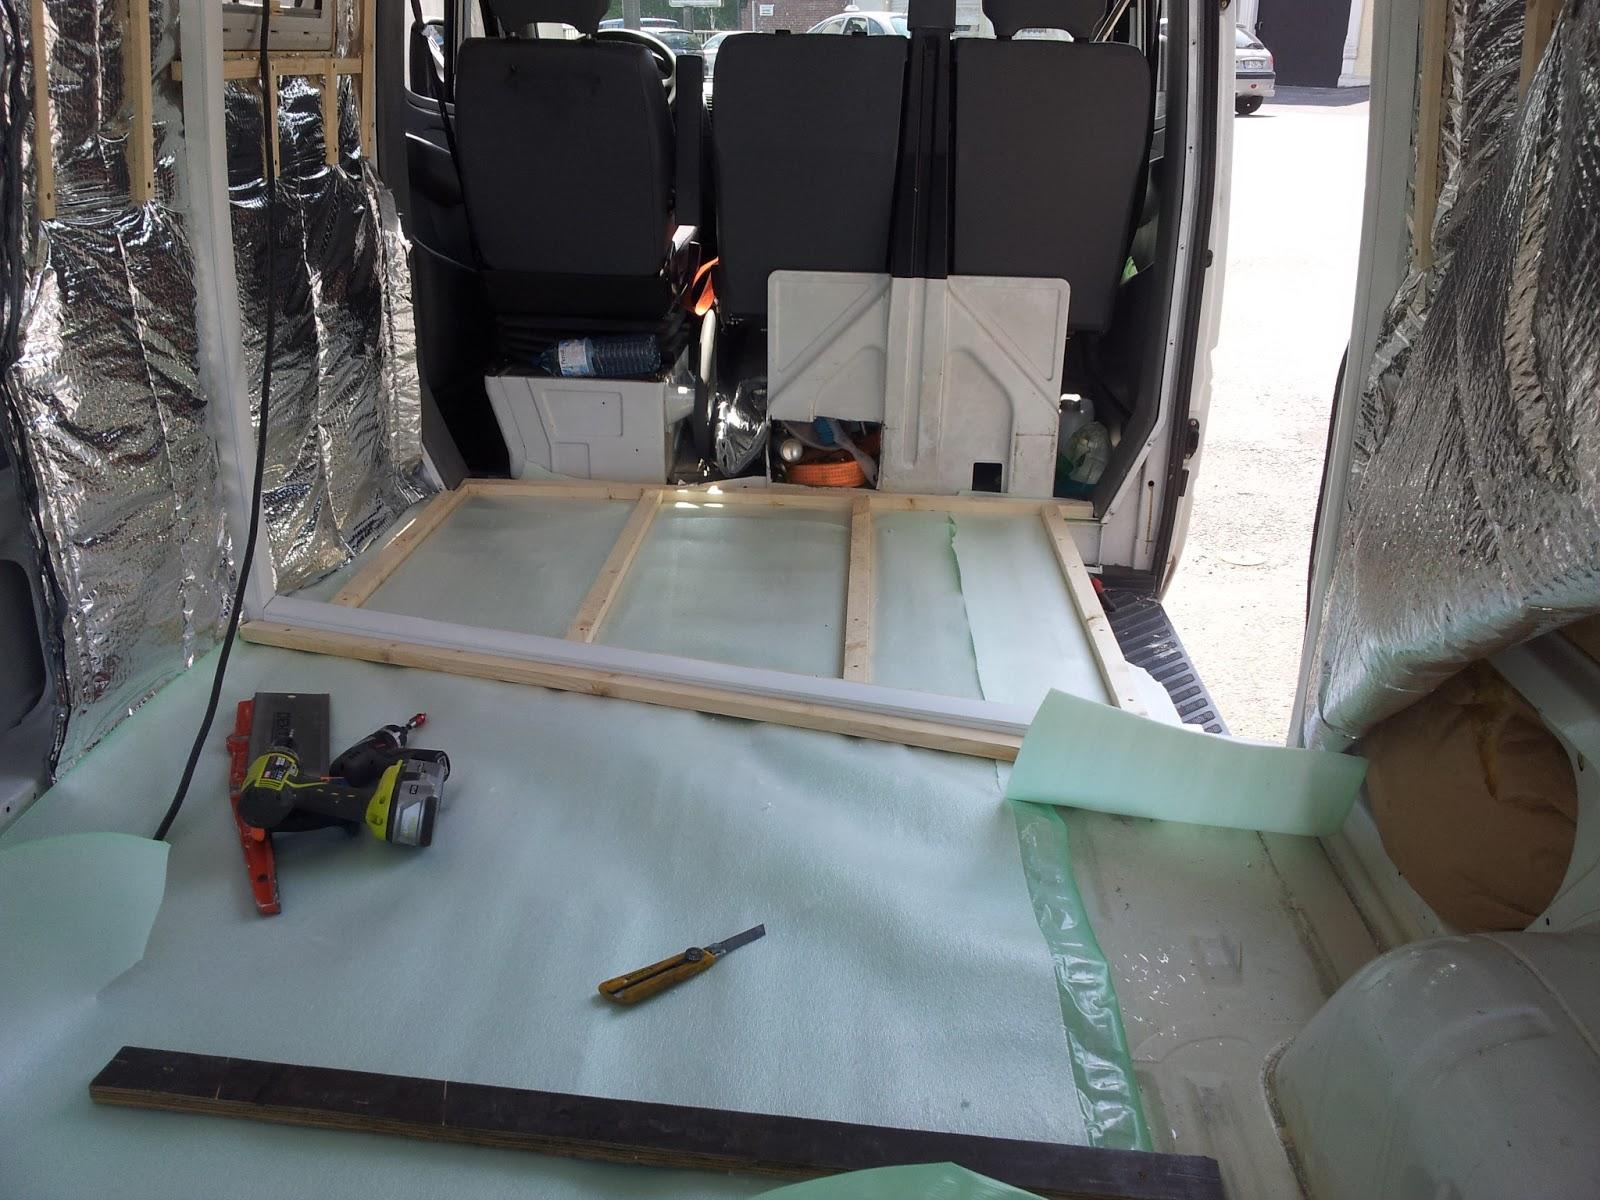 am nagement d 39 un sprinter en camping car isolation du sol. Black Bedroom Furniture Sets. Home Design Ideas